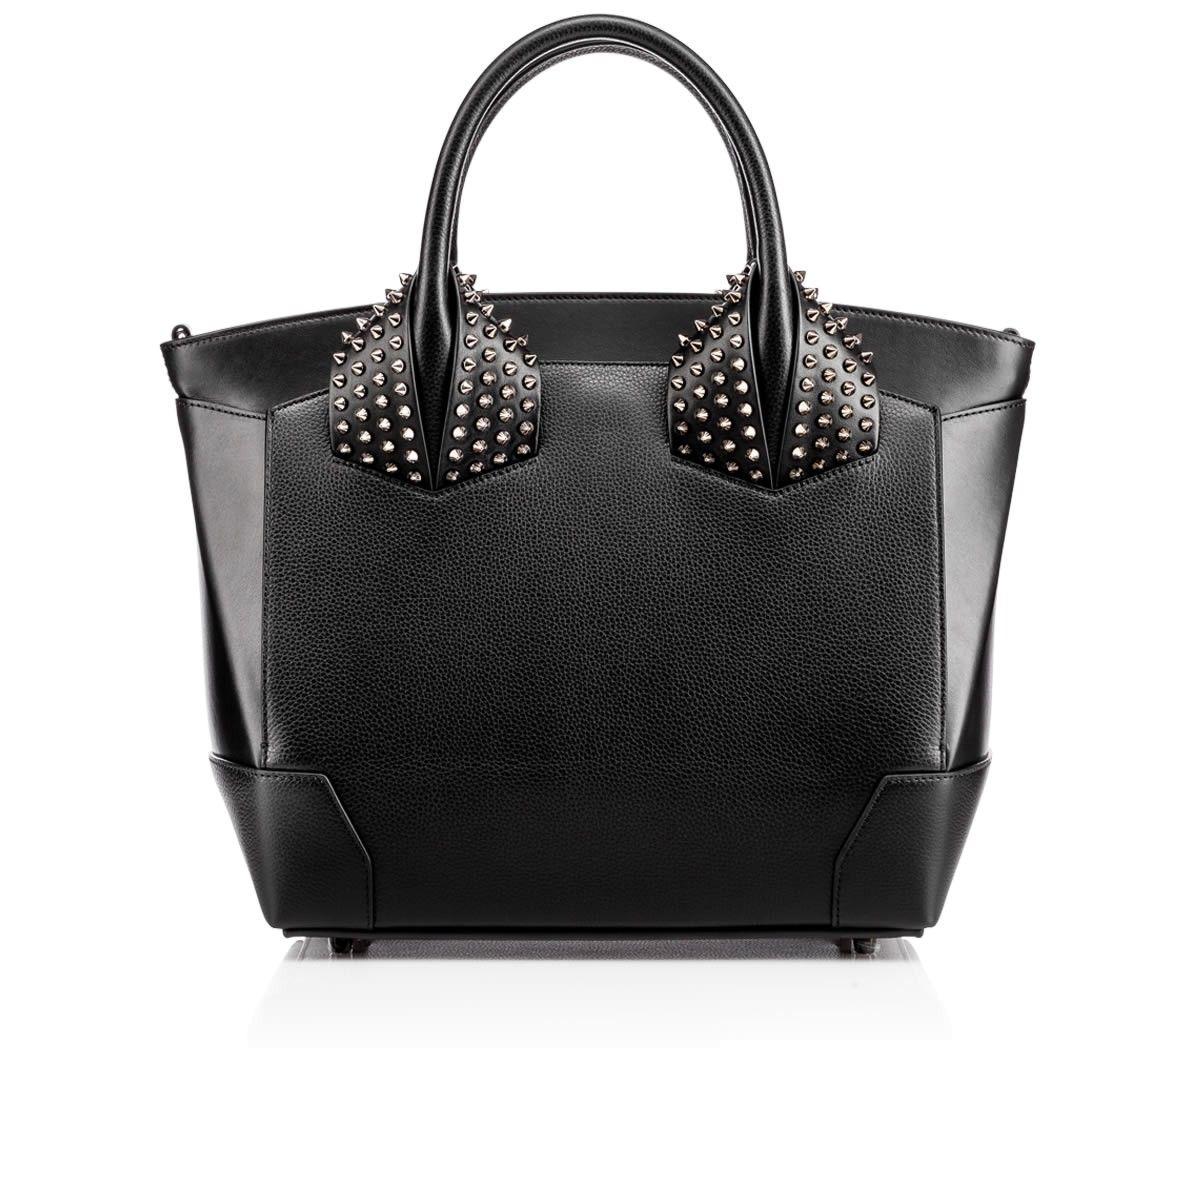 3a733e35cff CHRISTIAN LOUBOUTIN Eloise Large Two Handle Bag , Black, Calfskin ...